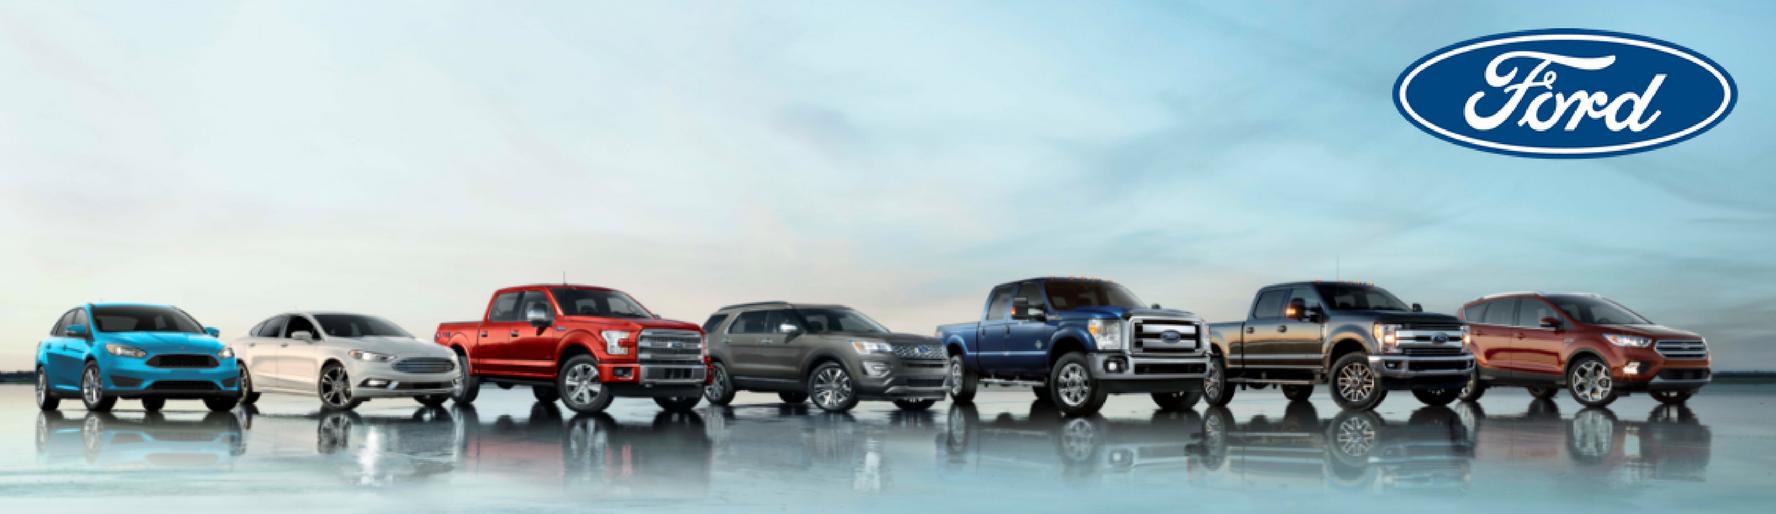 Haldeman Auto Group | New Lexus, Ford, Subaru dealership ...